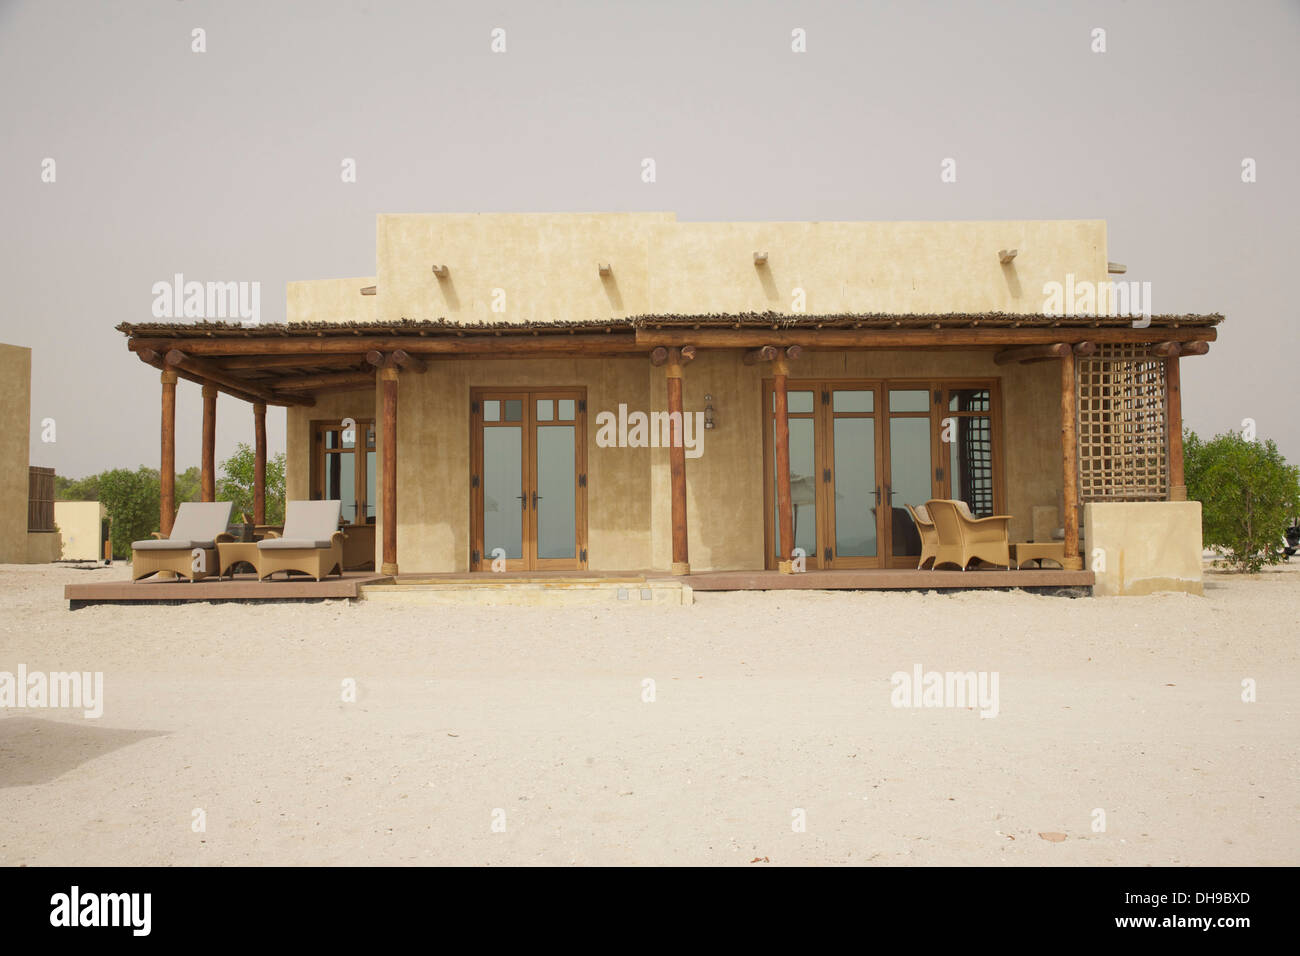 New beach villa at Sir Bani Yas Island, Abu Dhabi - Stock Image